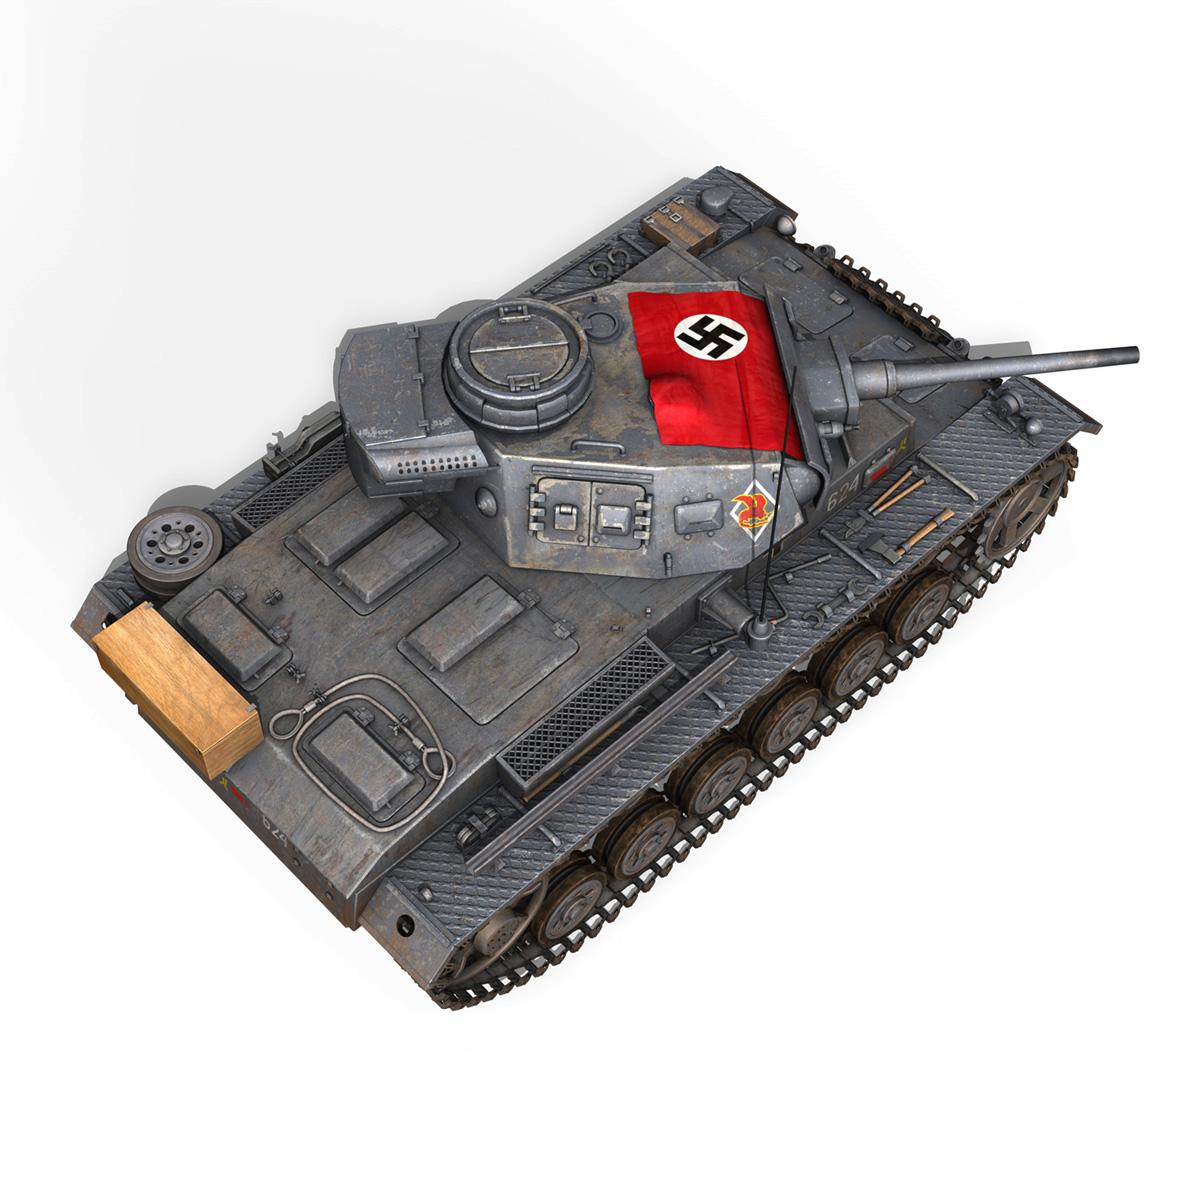 pzkpfw iii – panzer 3 – ausf.j – 624 3d model 3ds fbx lwo lw lws obj c4d 265306